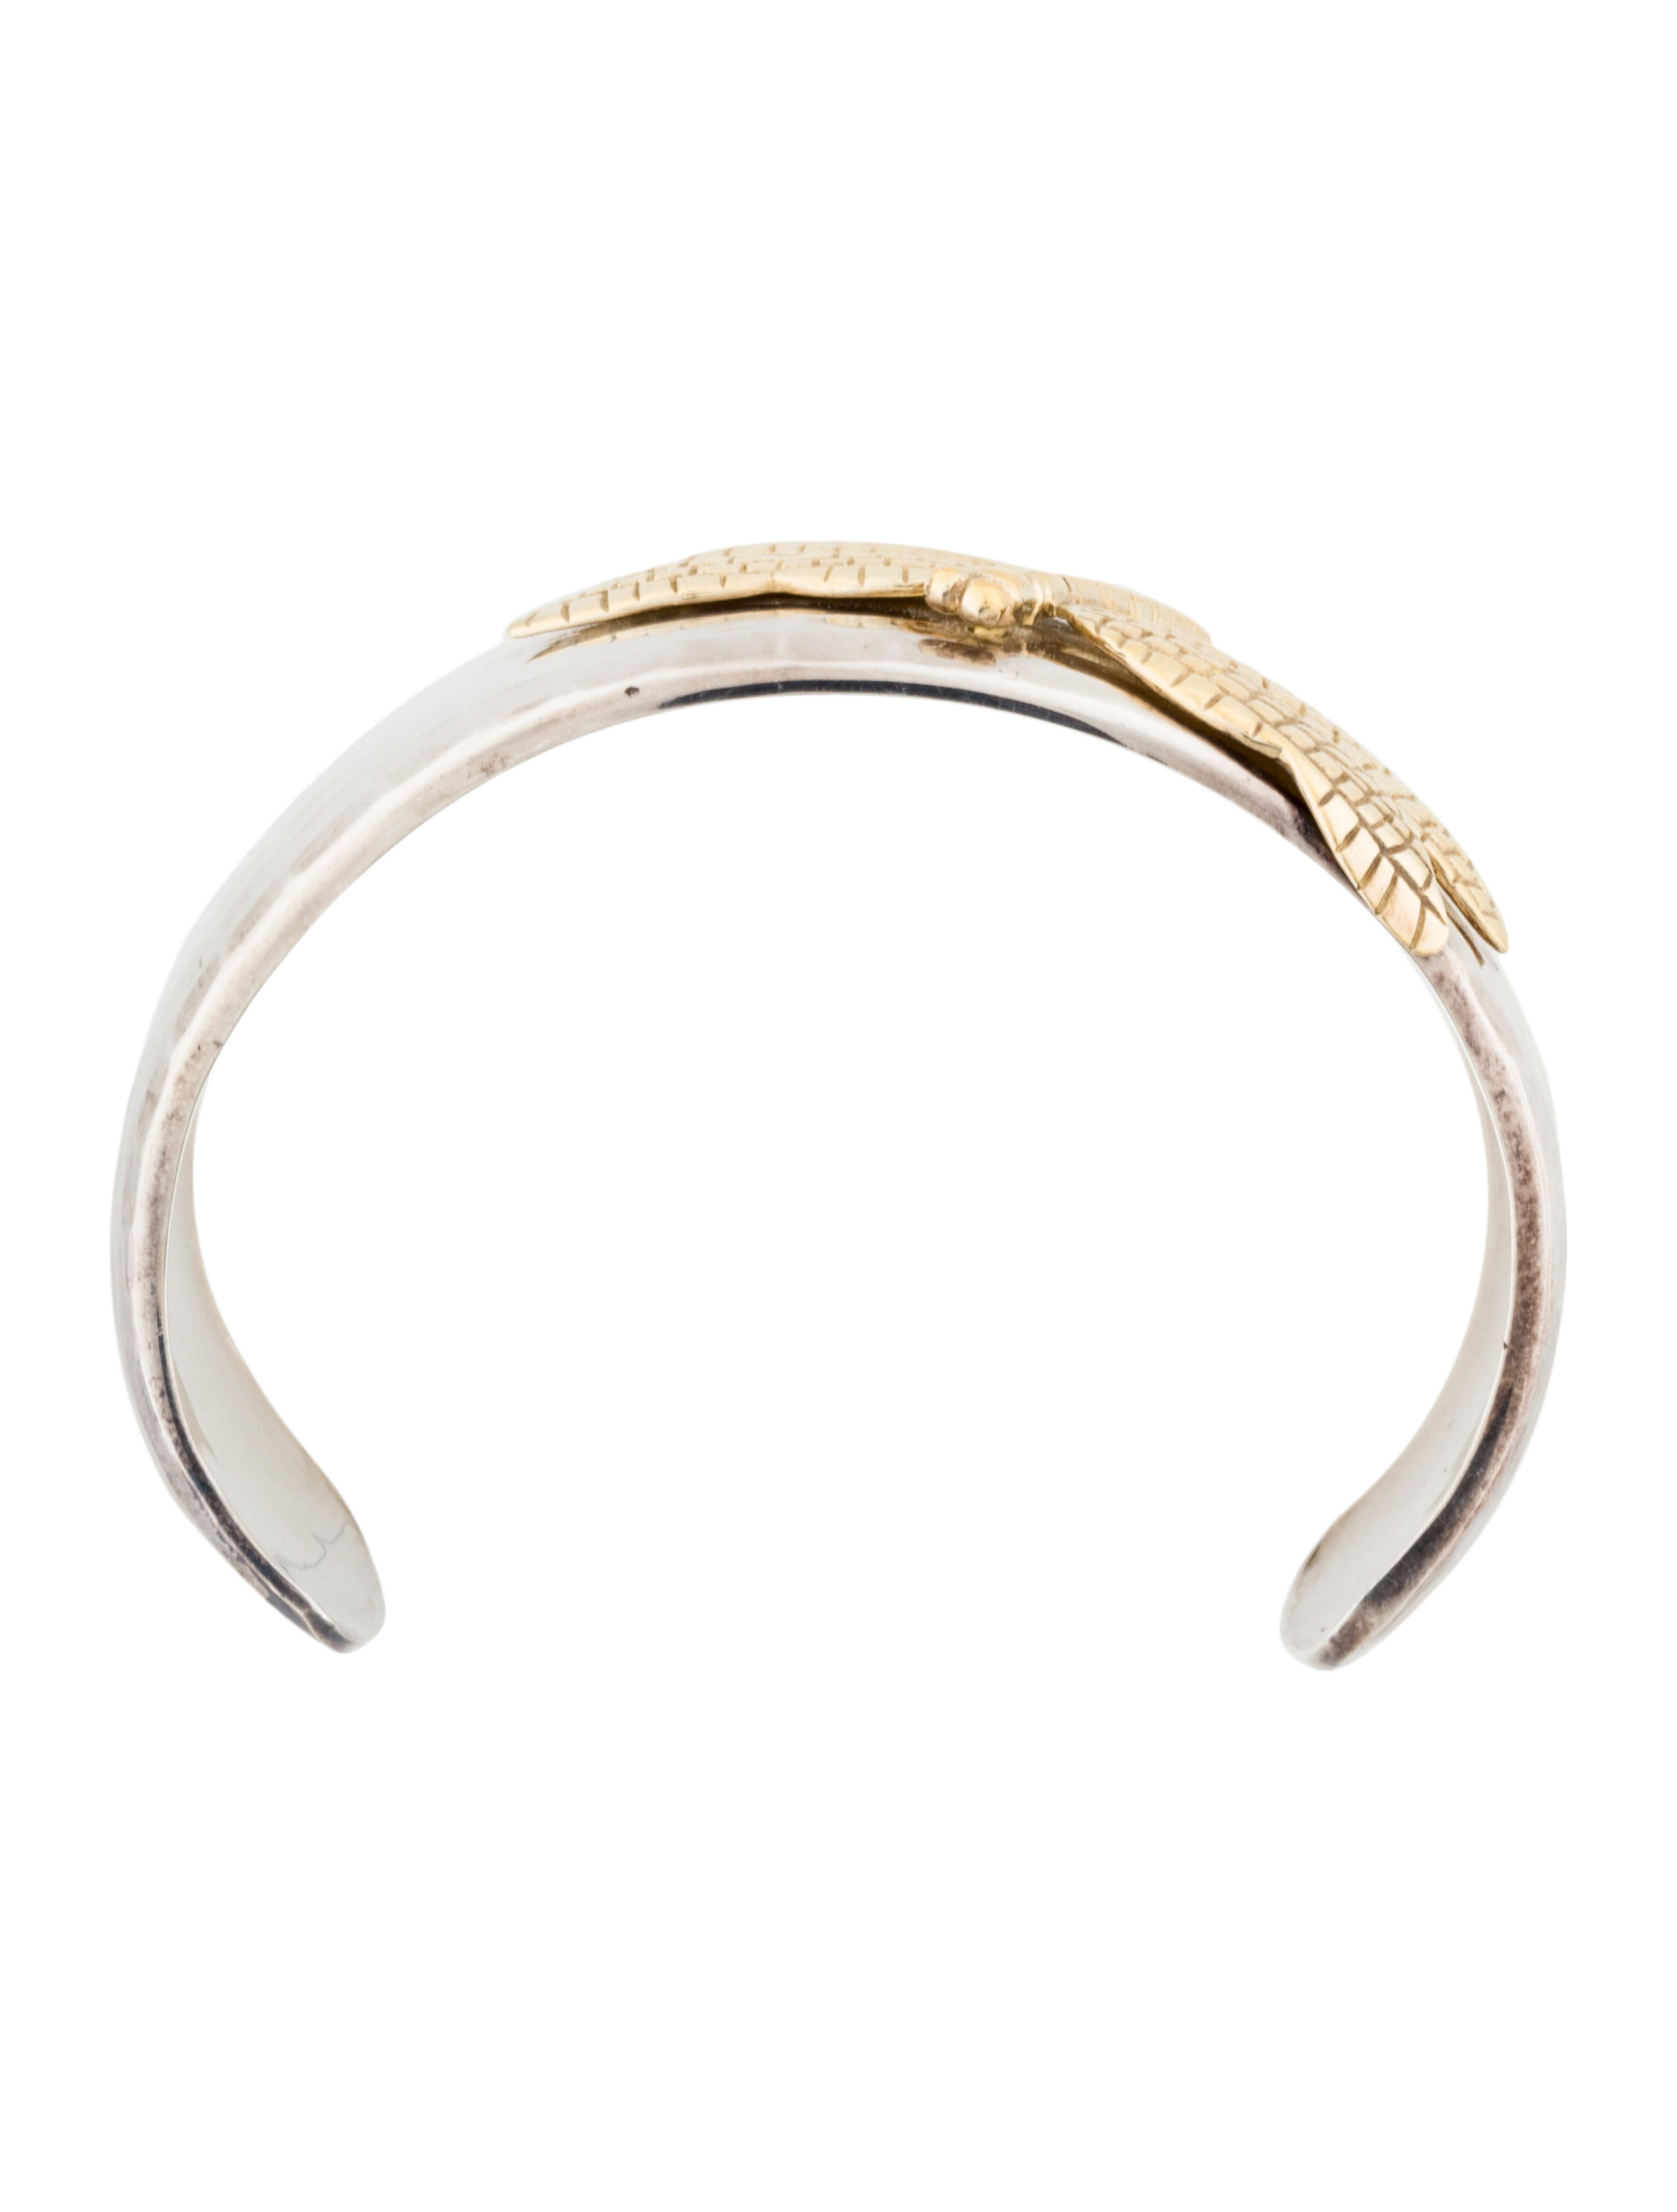 Tiffany Amp Co Two Tone Dragonfly Cuff Bracelet Bracelets